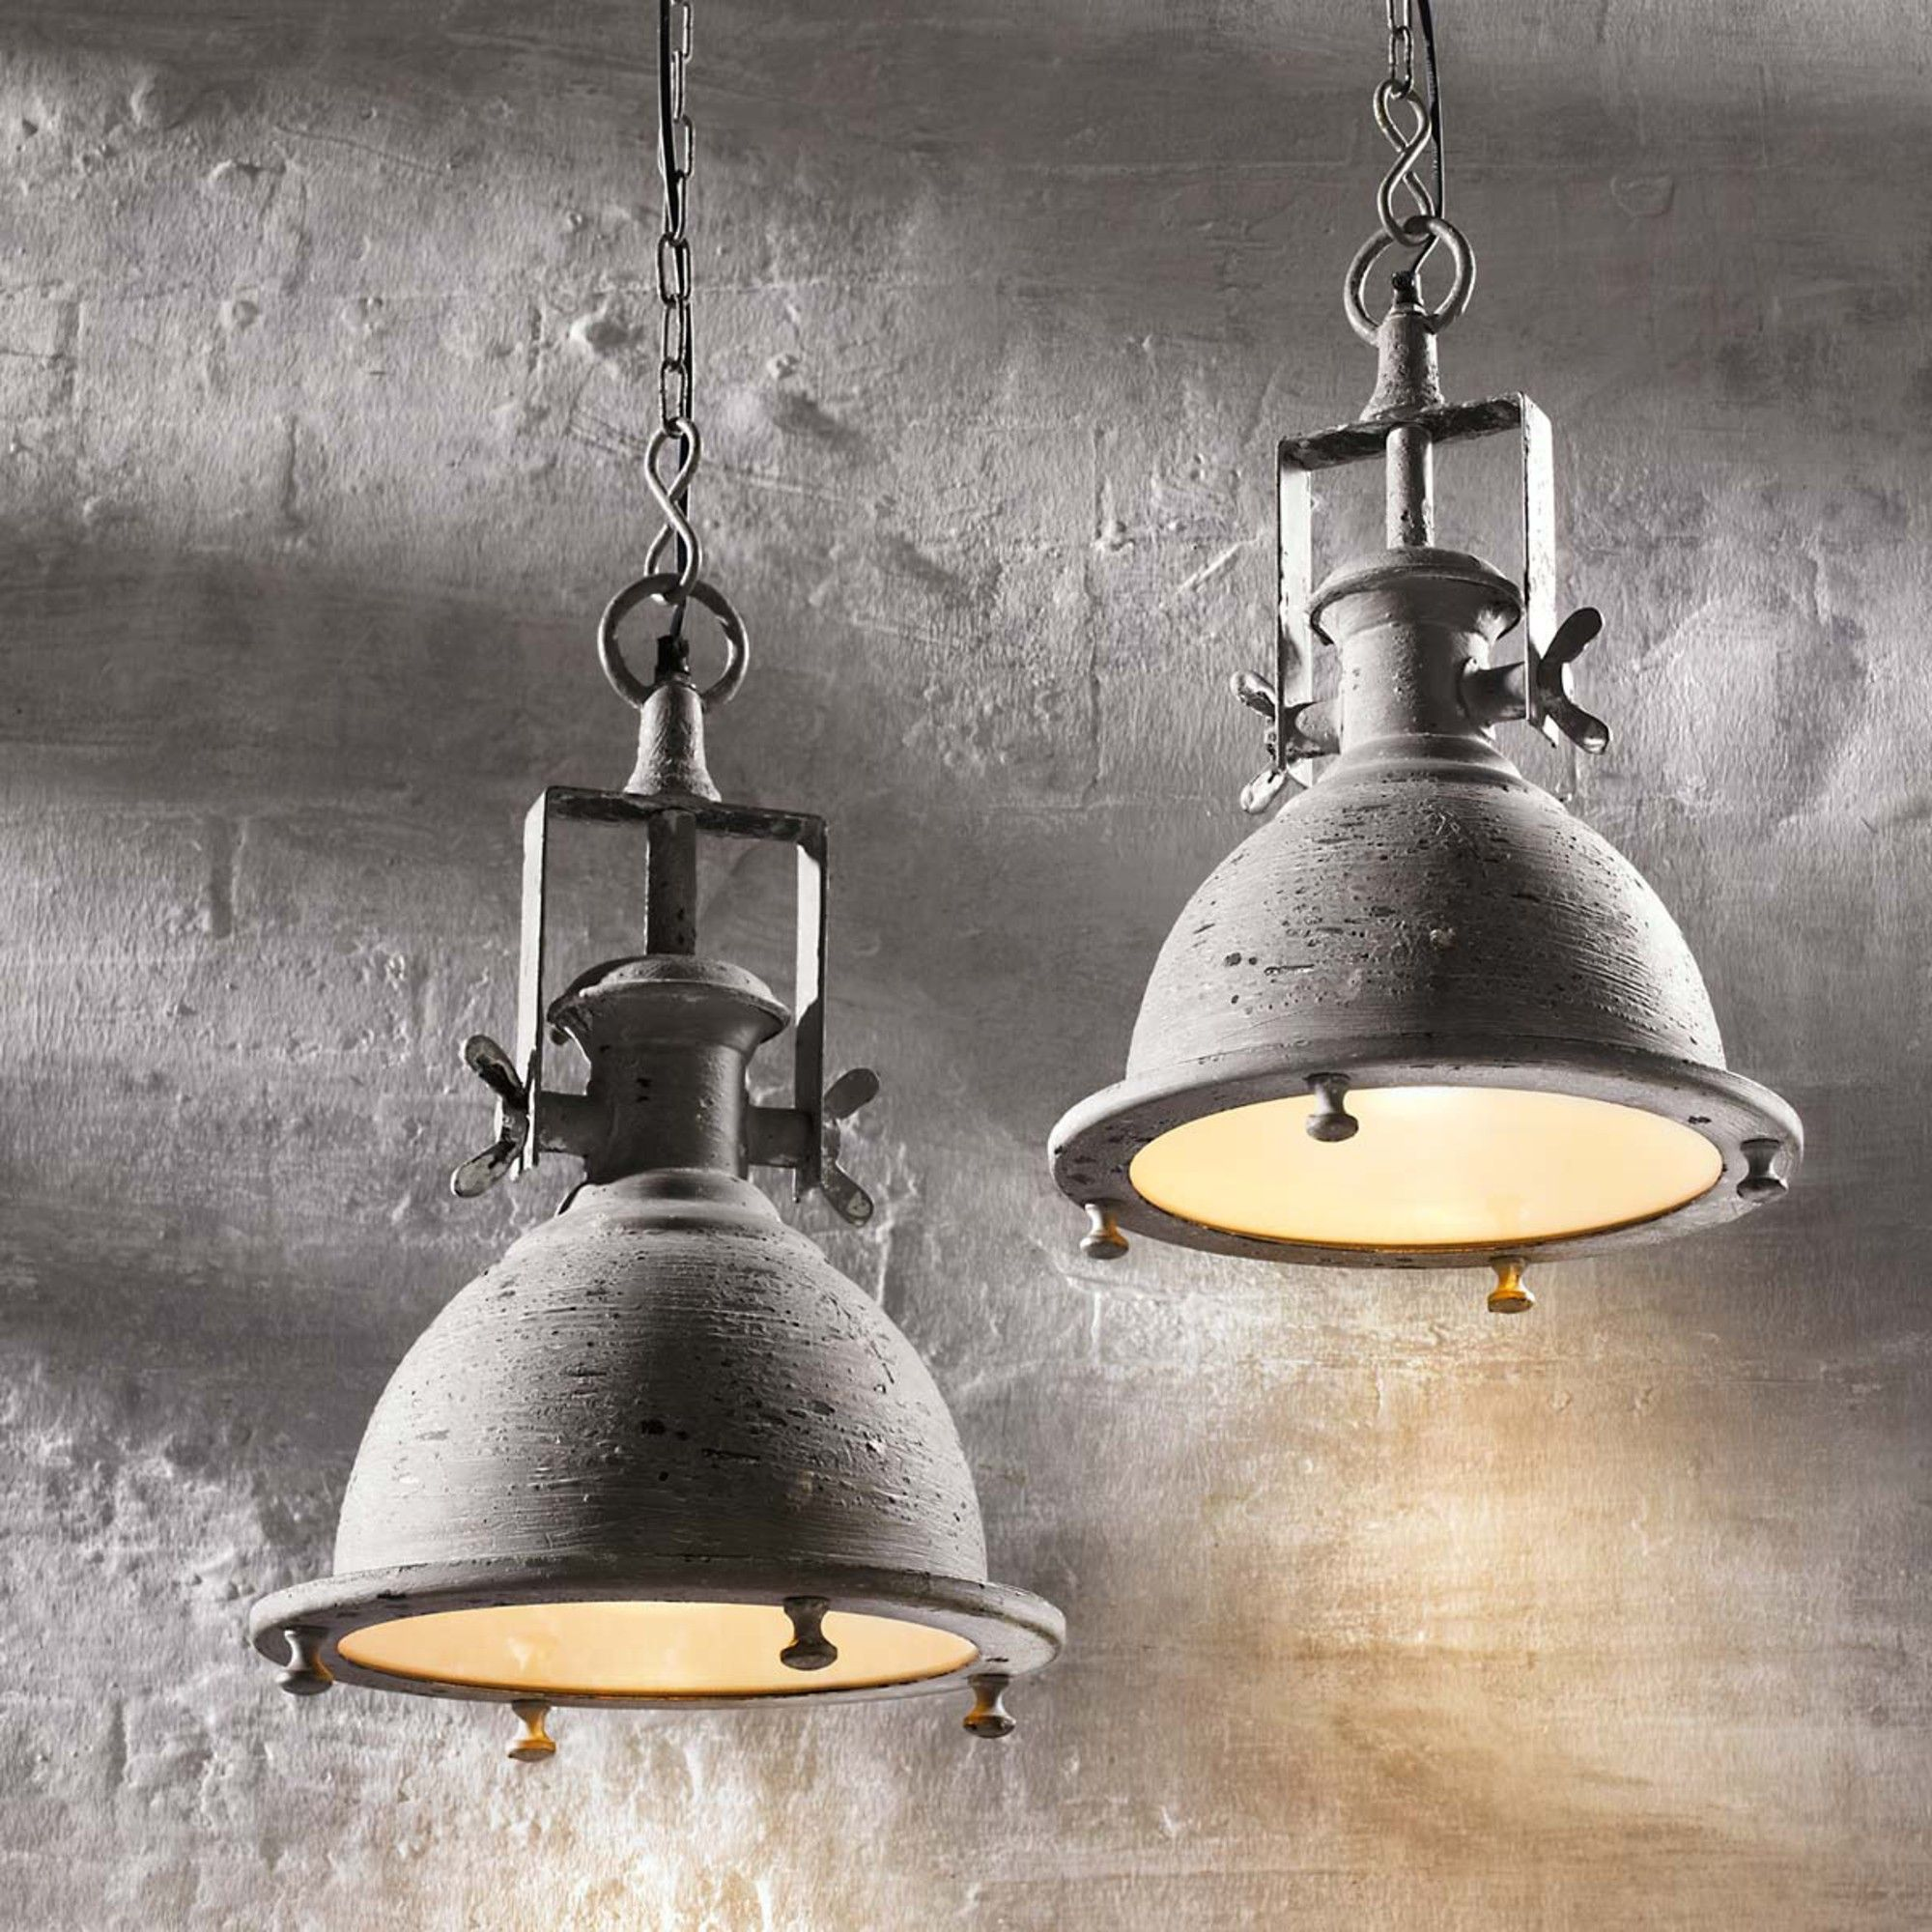 Industrie Lampe Vintage LampePendelleuchte Antik